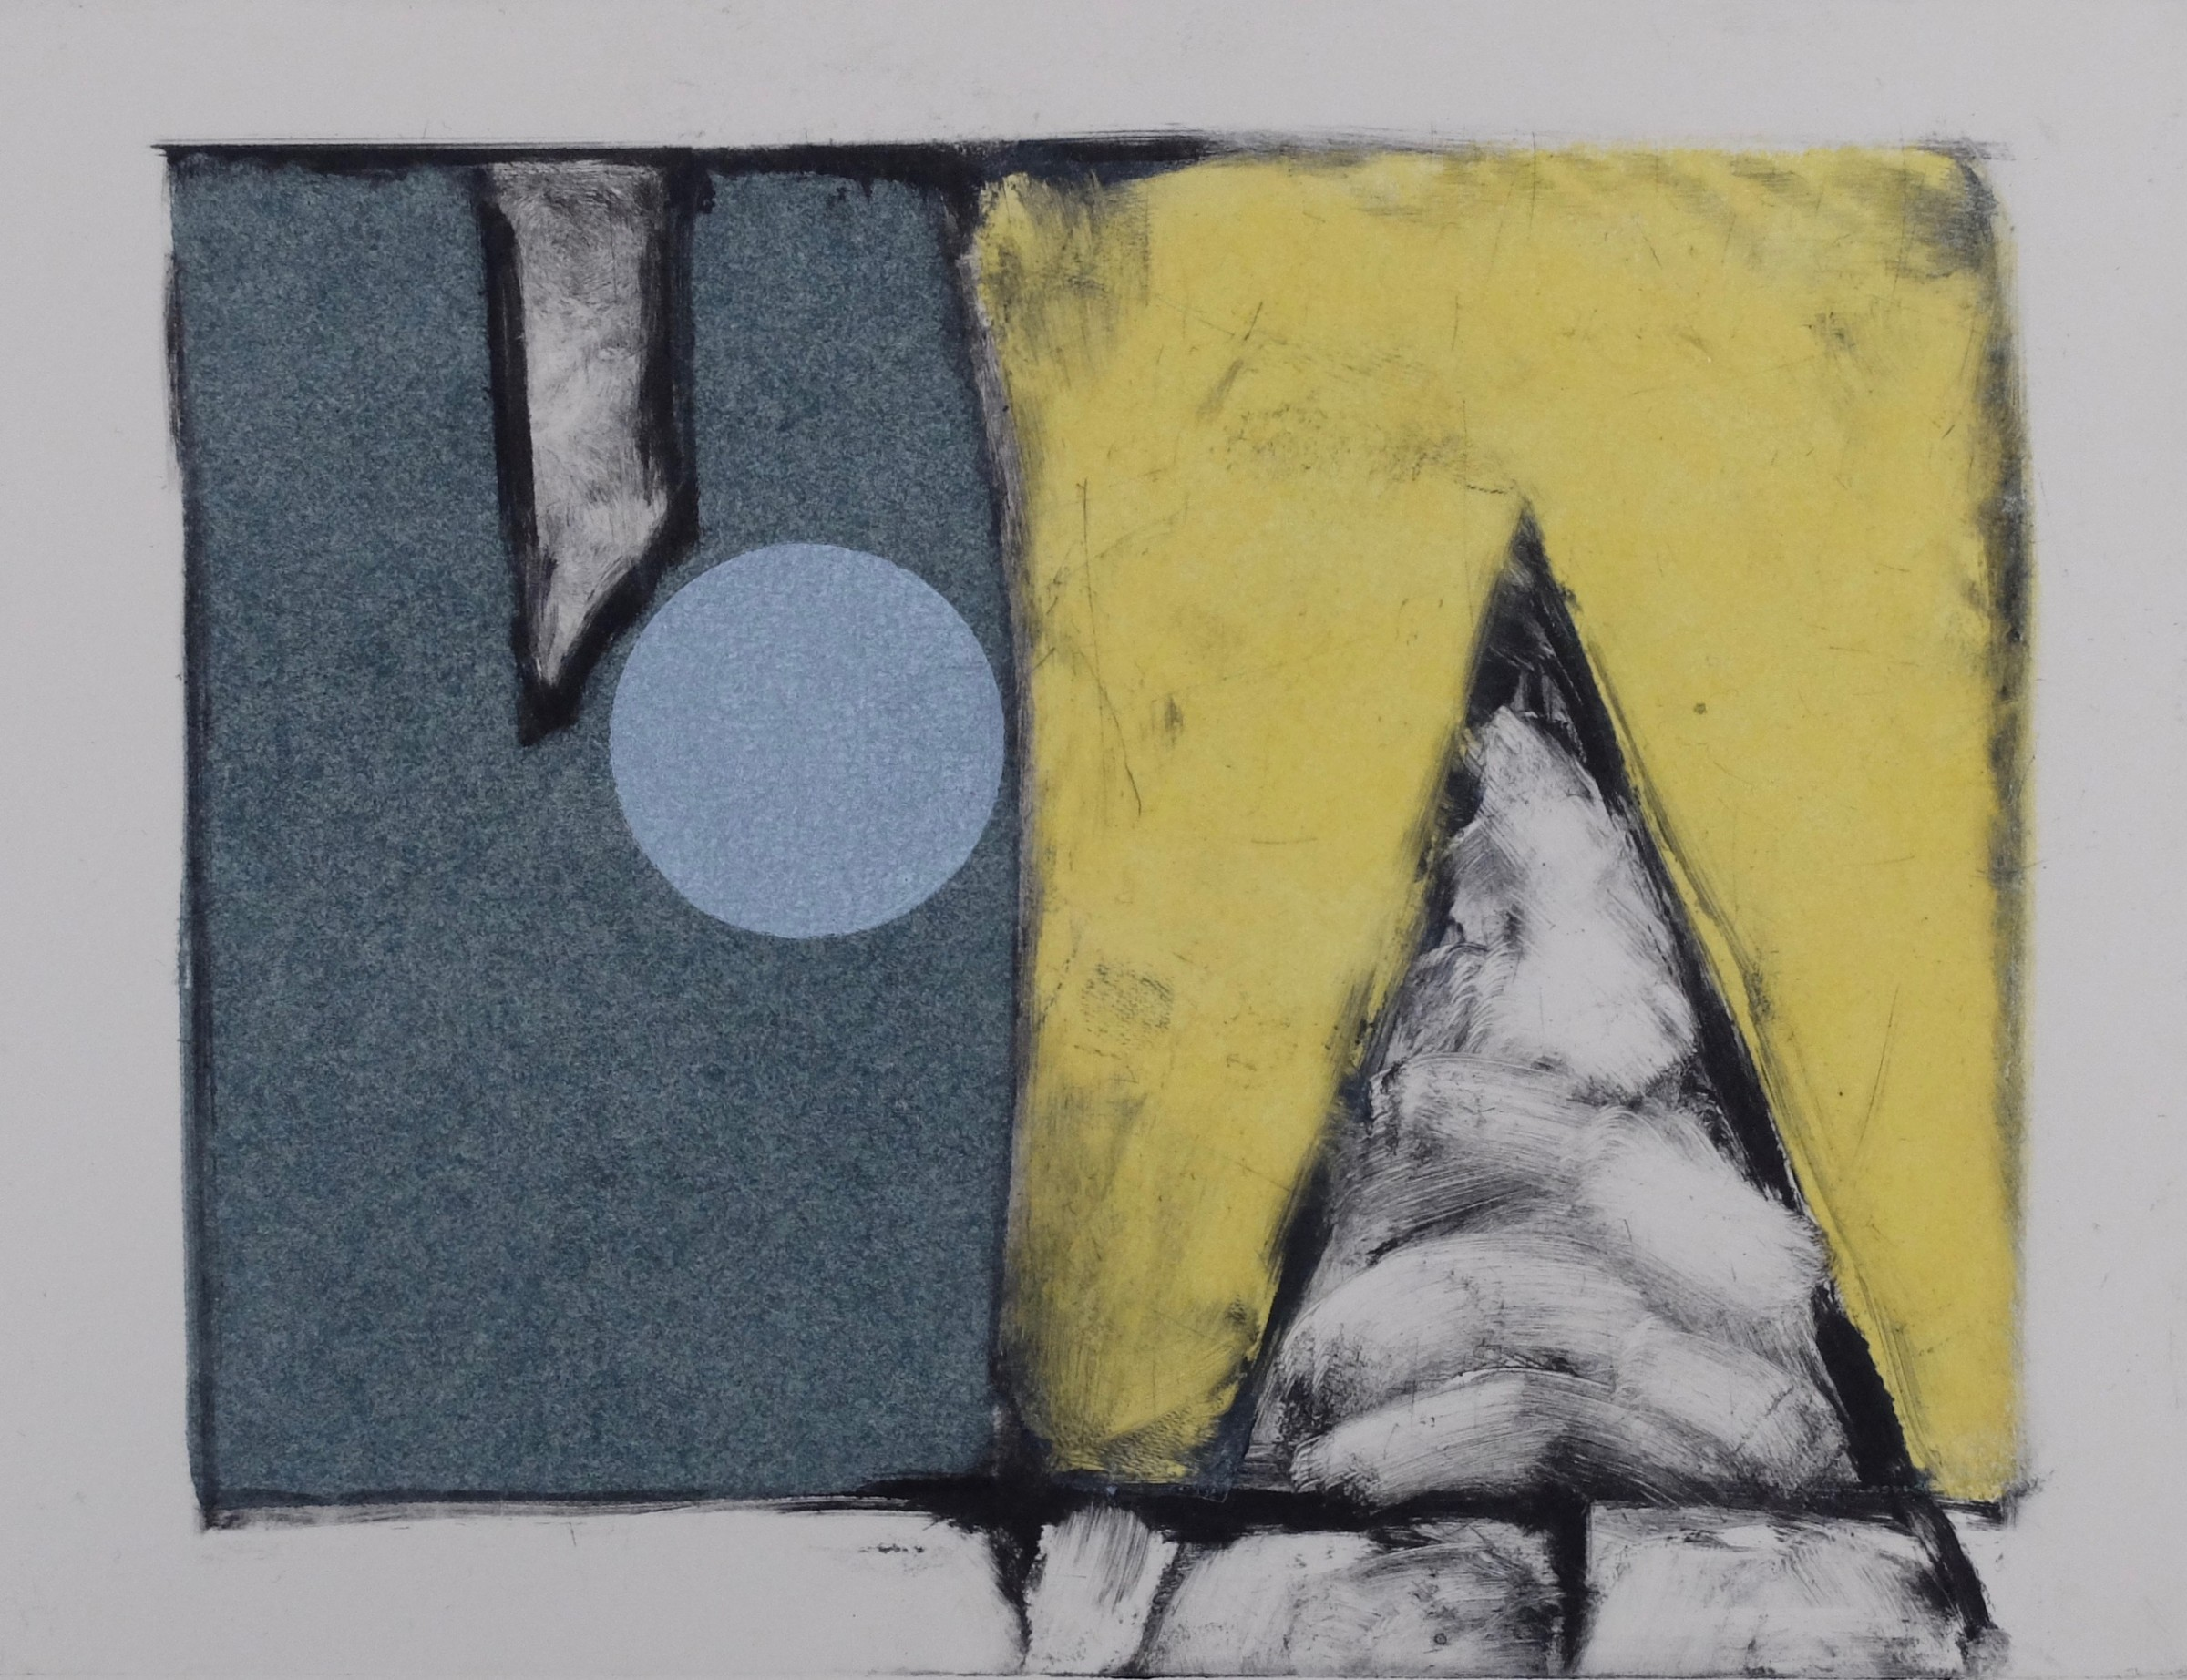 "<span class=""link fancybox-details-link""><a href=""/exhibitions/23/works/artworks_standalone11154/"">View Detail Page</a></span><div class=""artist""><span class=""artist""><strong>Robert Baggaley RE</strong></span></div><div class=""title""><em>Zigurat</em></div><div class=""medium"">monotype</div><div class=""dimensions"">25 x 34 cm paper size<br>15 x 18 cm image size</div><div class=""edition_details"">unique</div>"